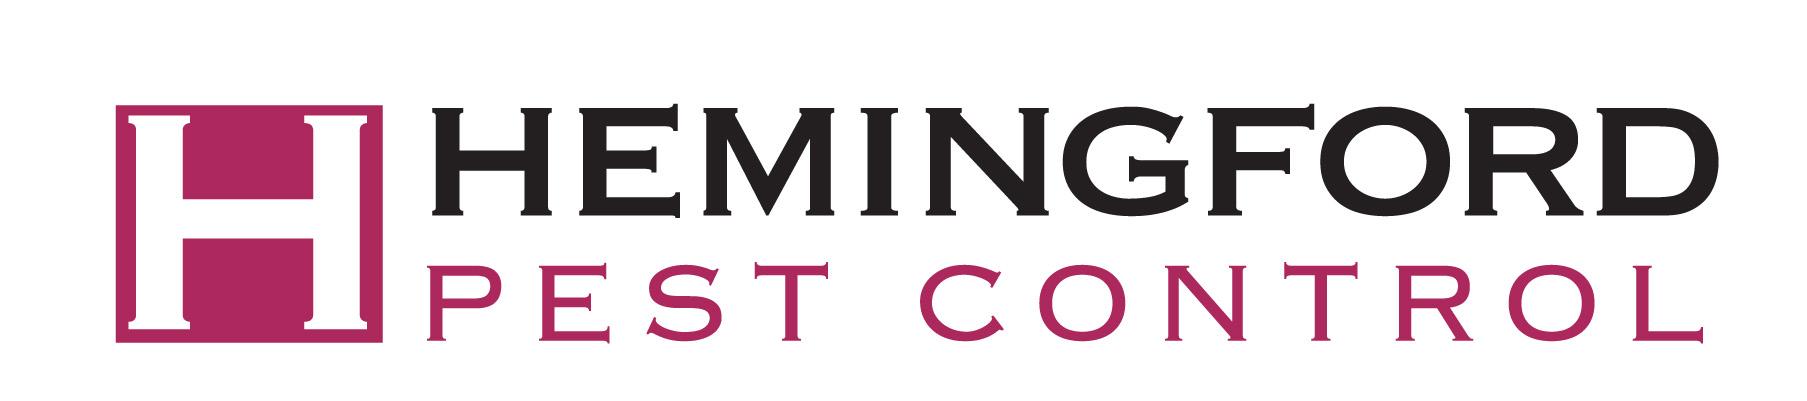 Hemingford Pest Control Wendover 01296 620490